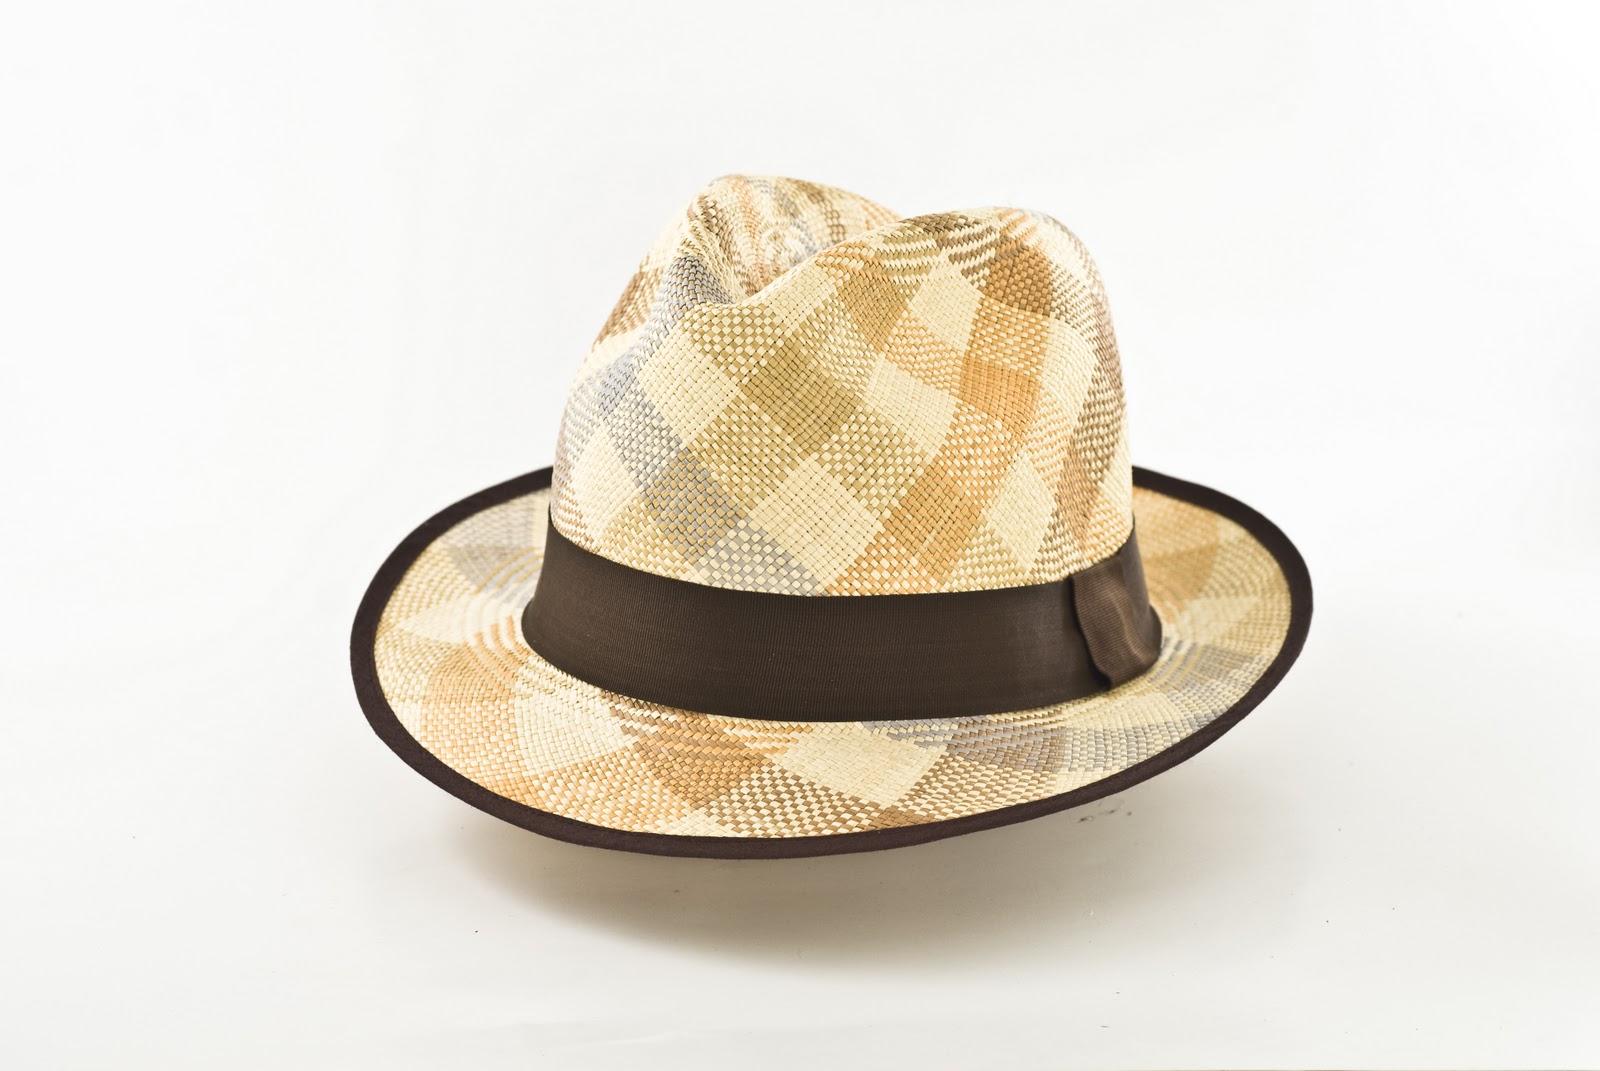 ECUAPANAMAHAT Sombreros de Paja Toquilla